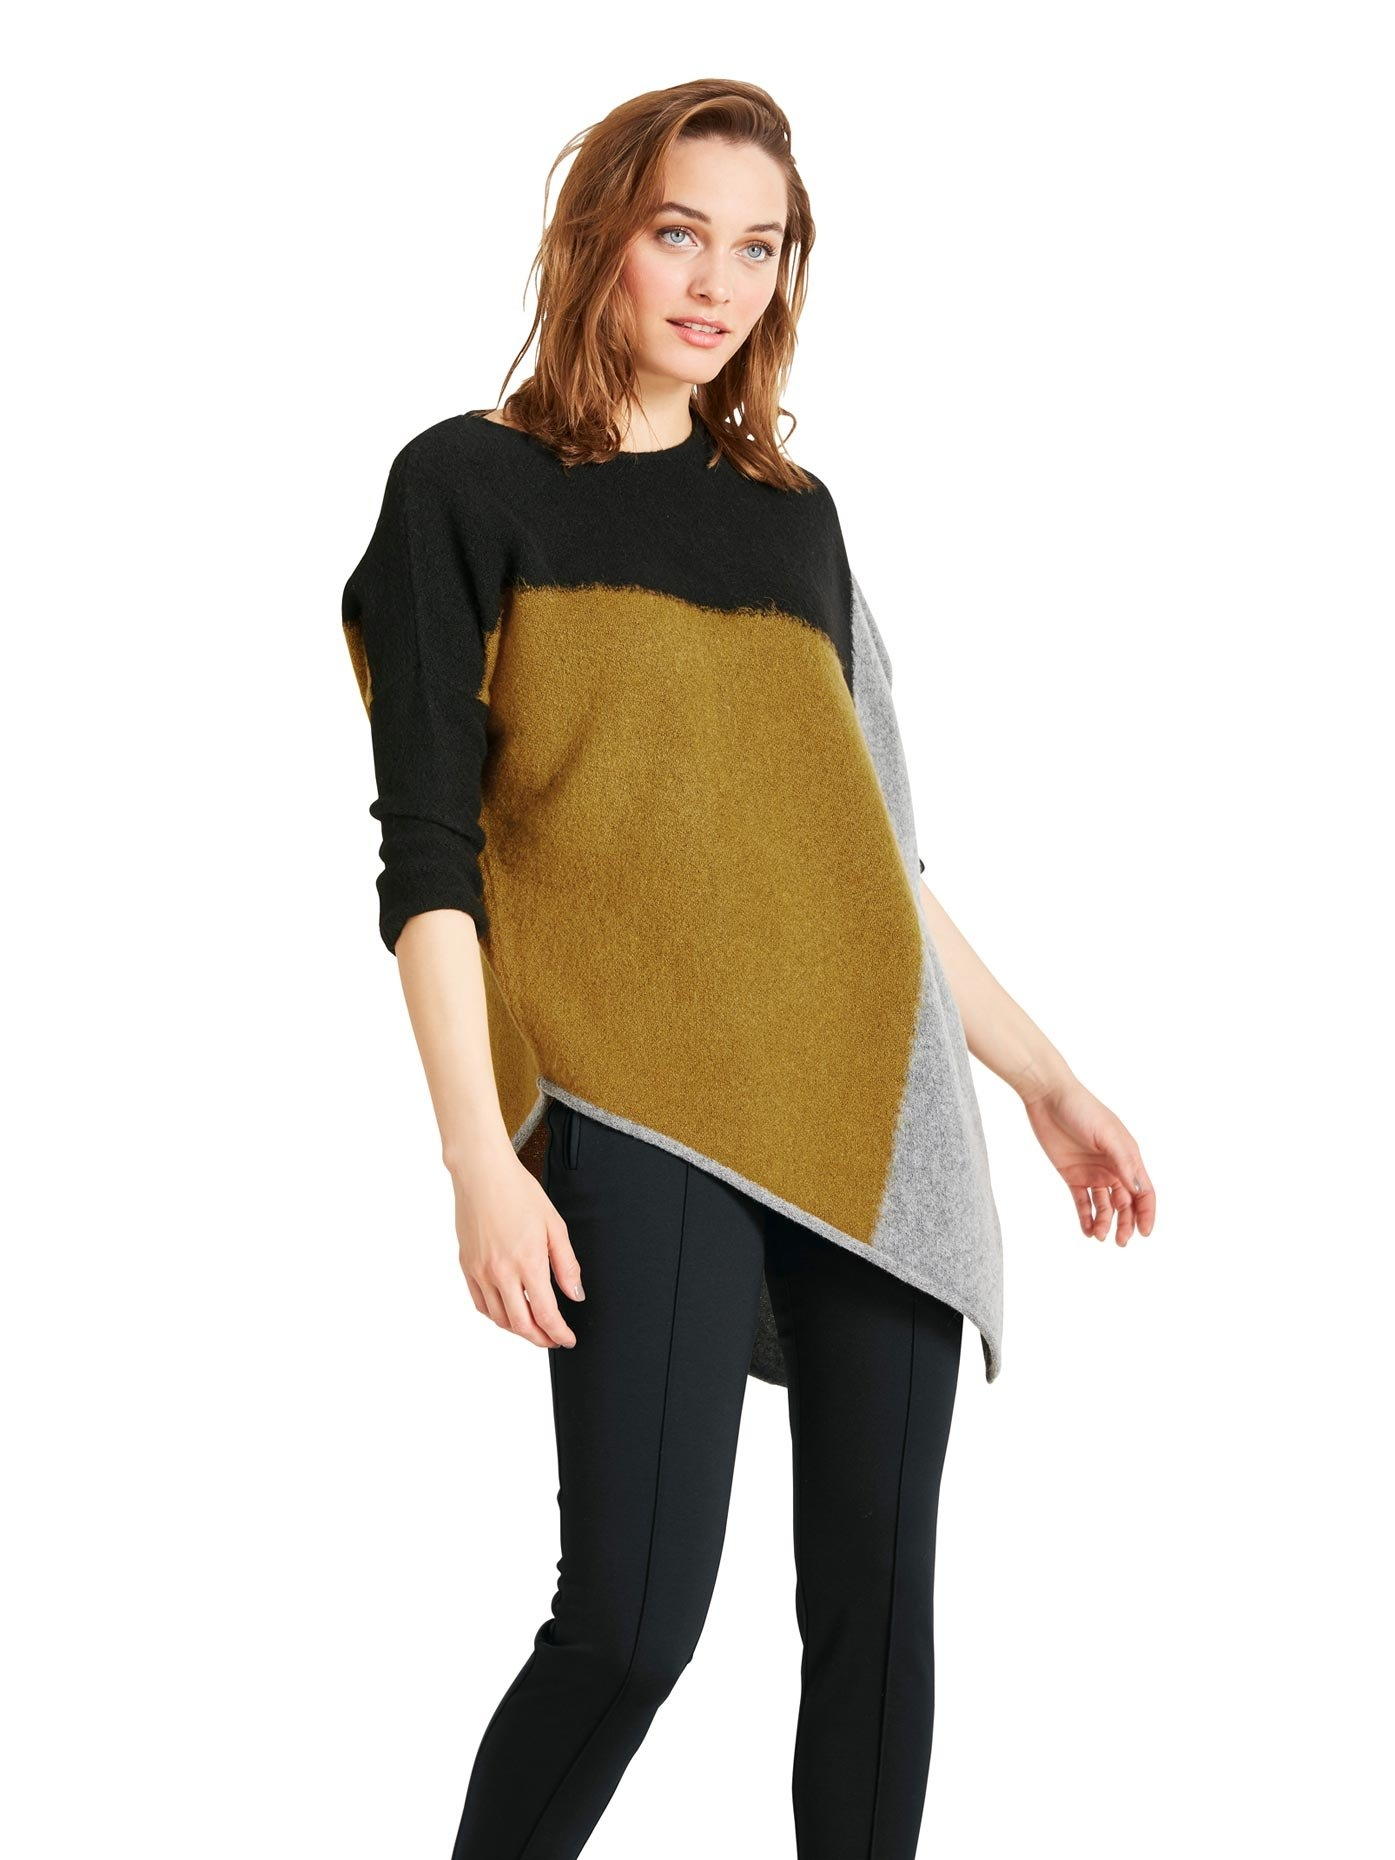 RICK CARDONA by Heine gebreide trui met 3/4 mouwen - verschillende betaalmethodes